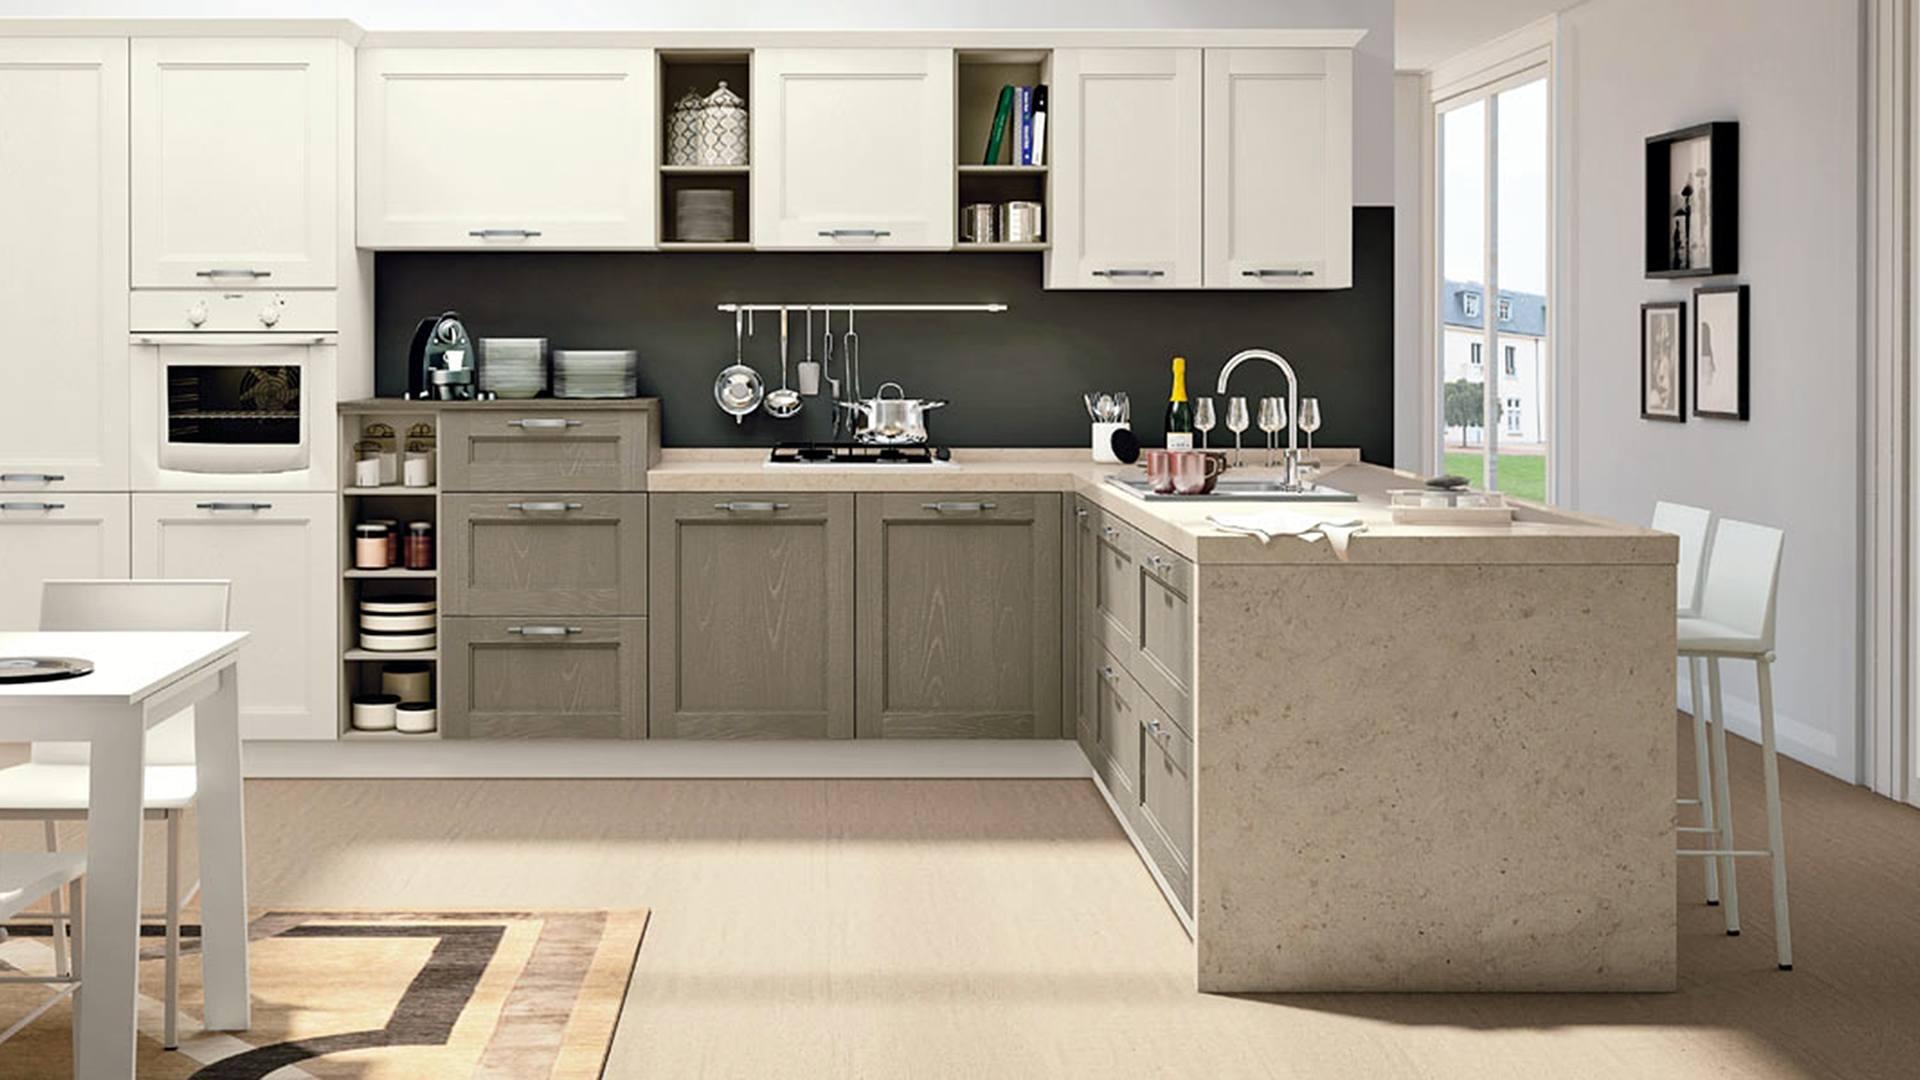 Mattonelle cucina bianca best parete lustrata delle mattonelle in